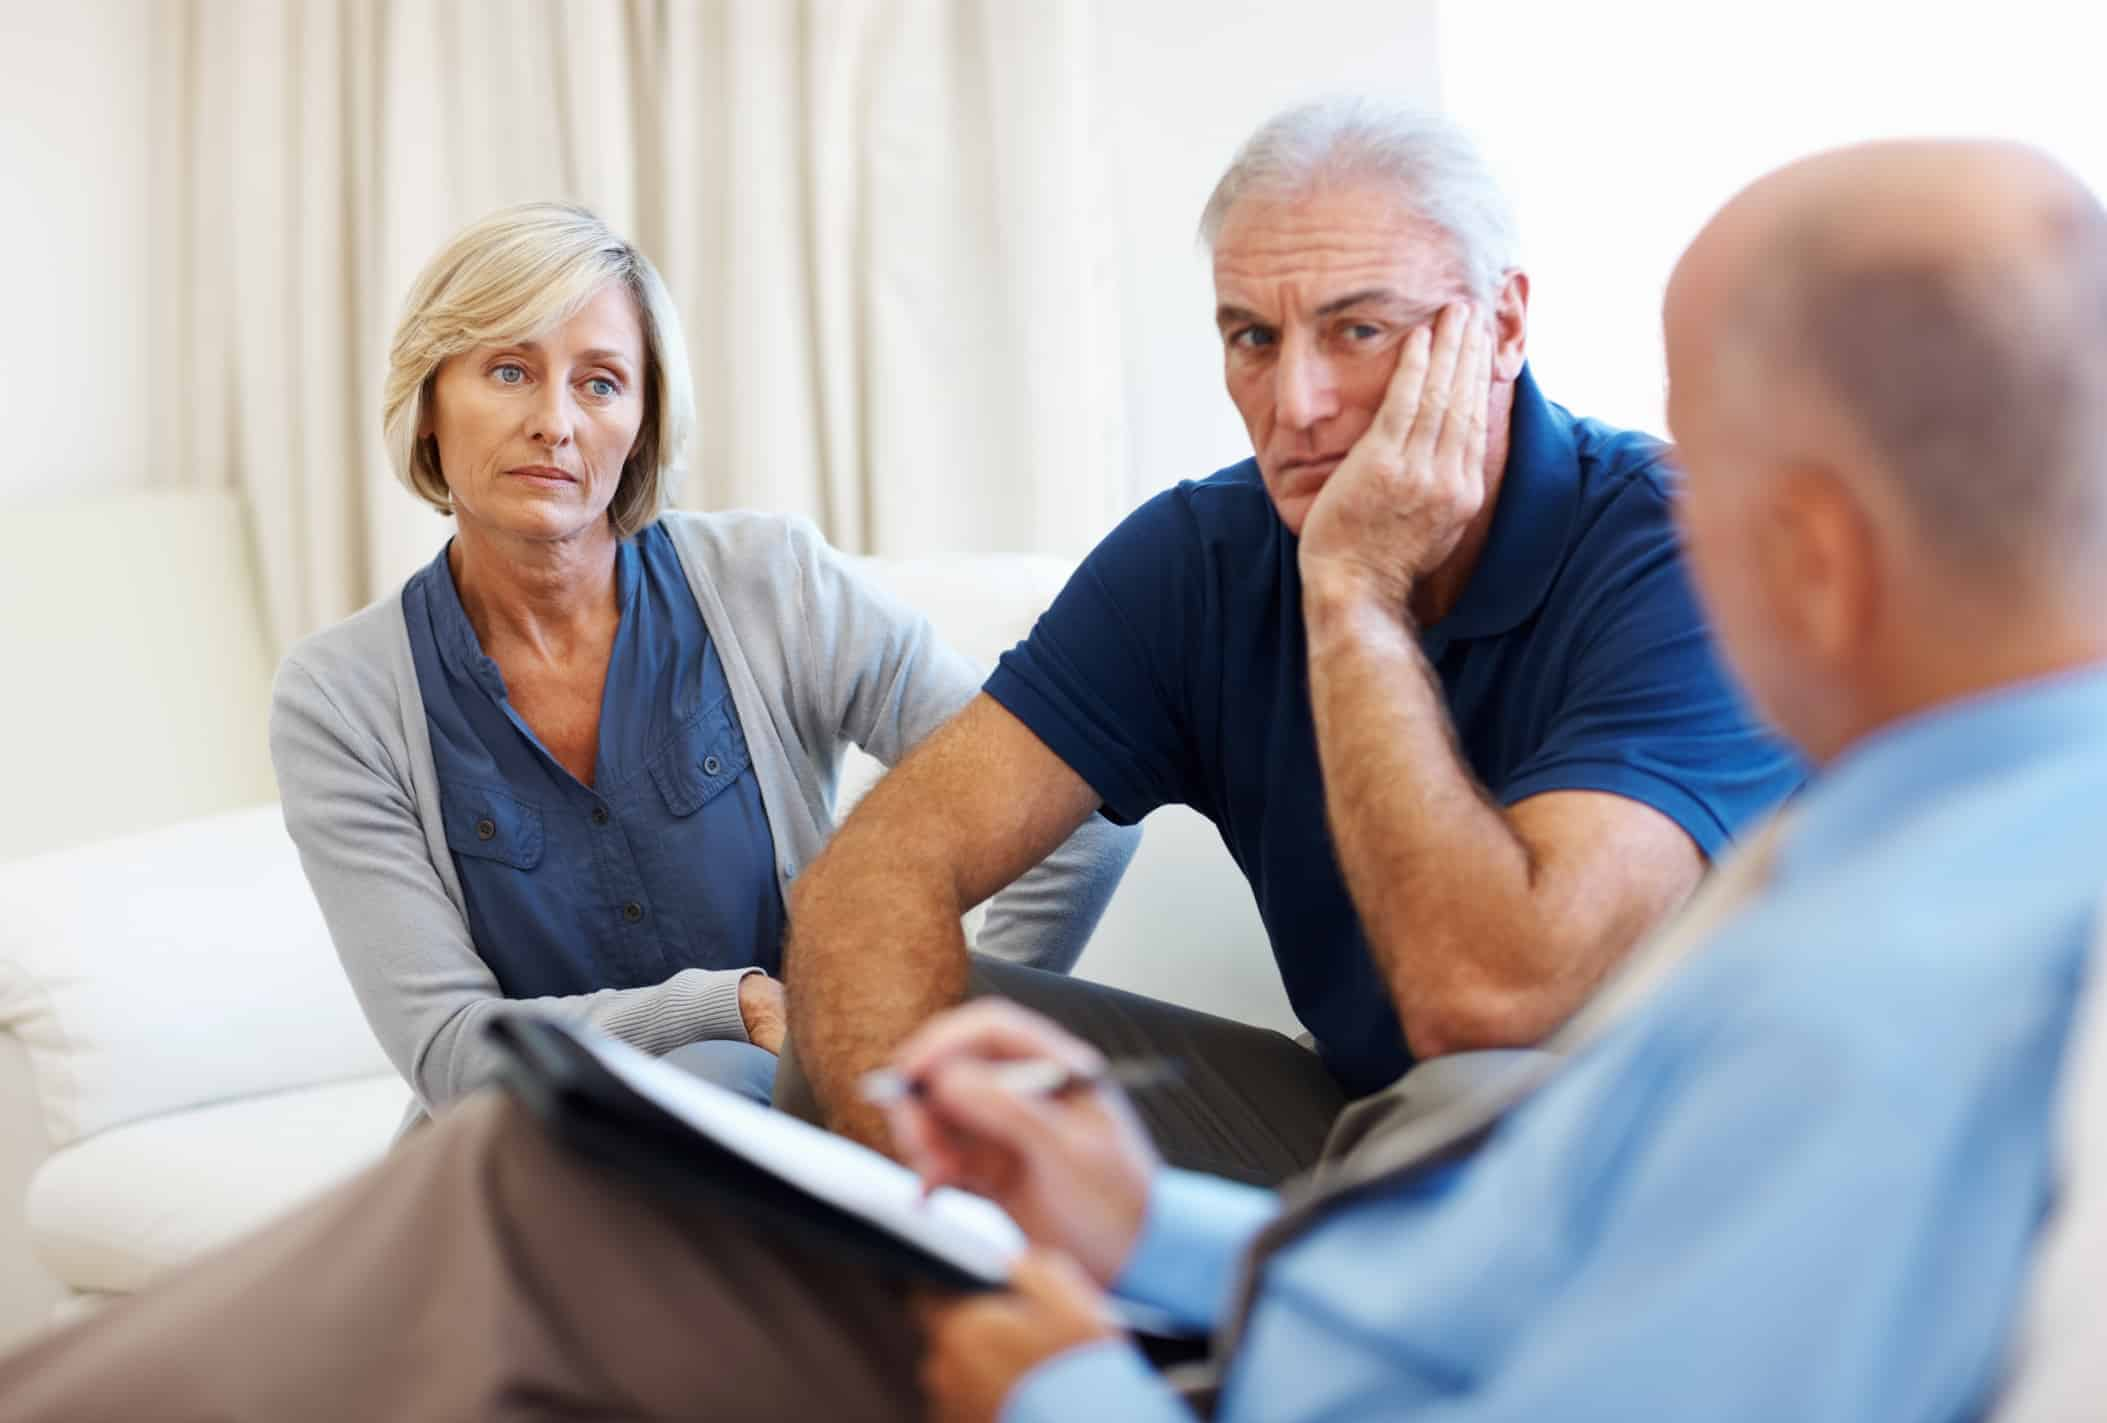 Tense senior couple meeting with their counsellor.